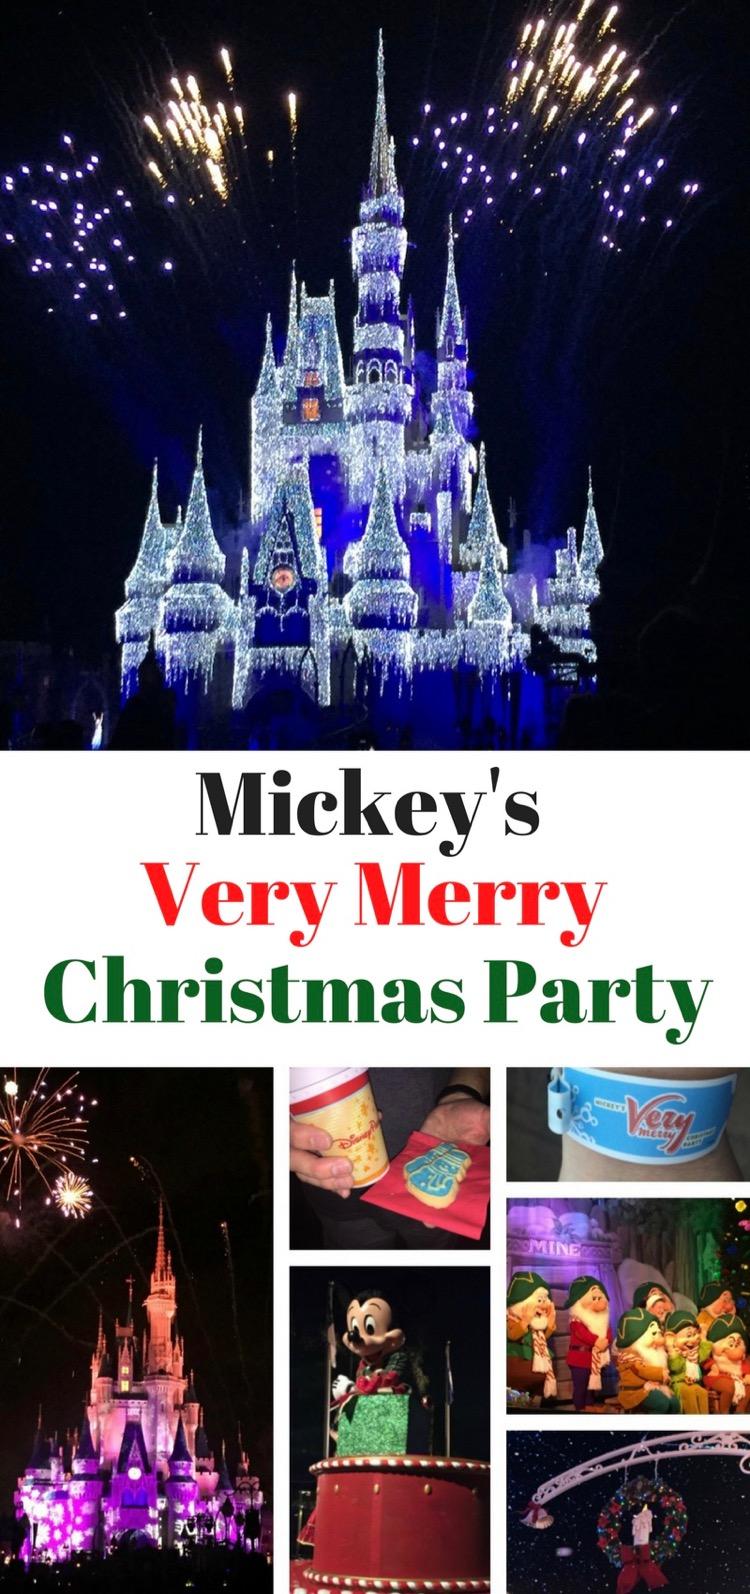 mickeys-very-merry-christmas-party-2016